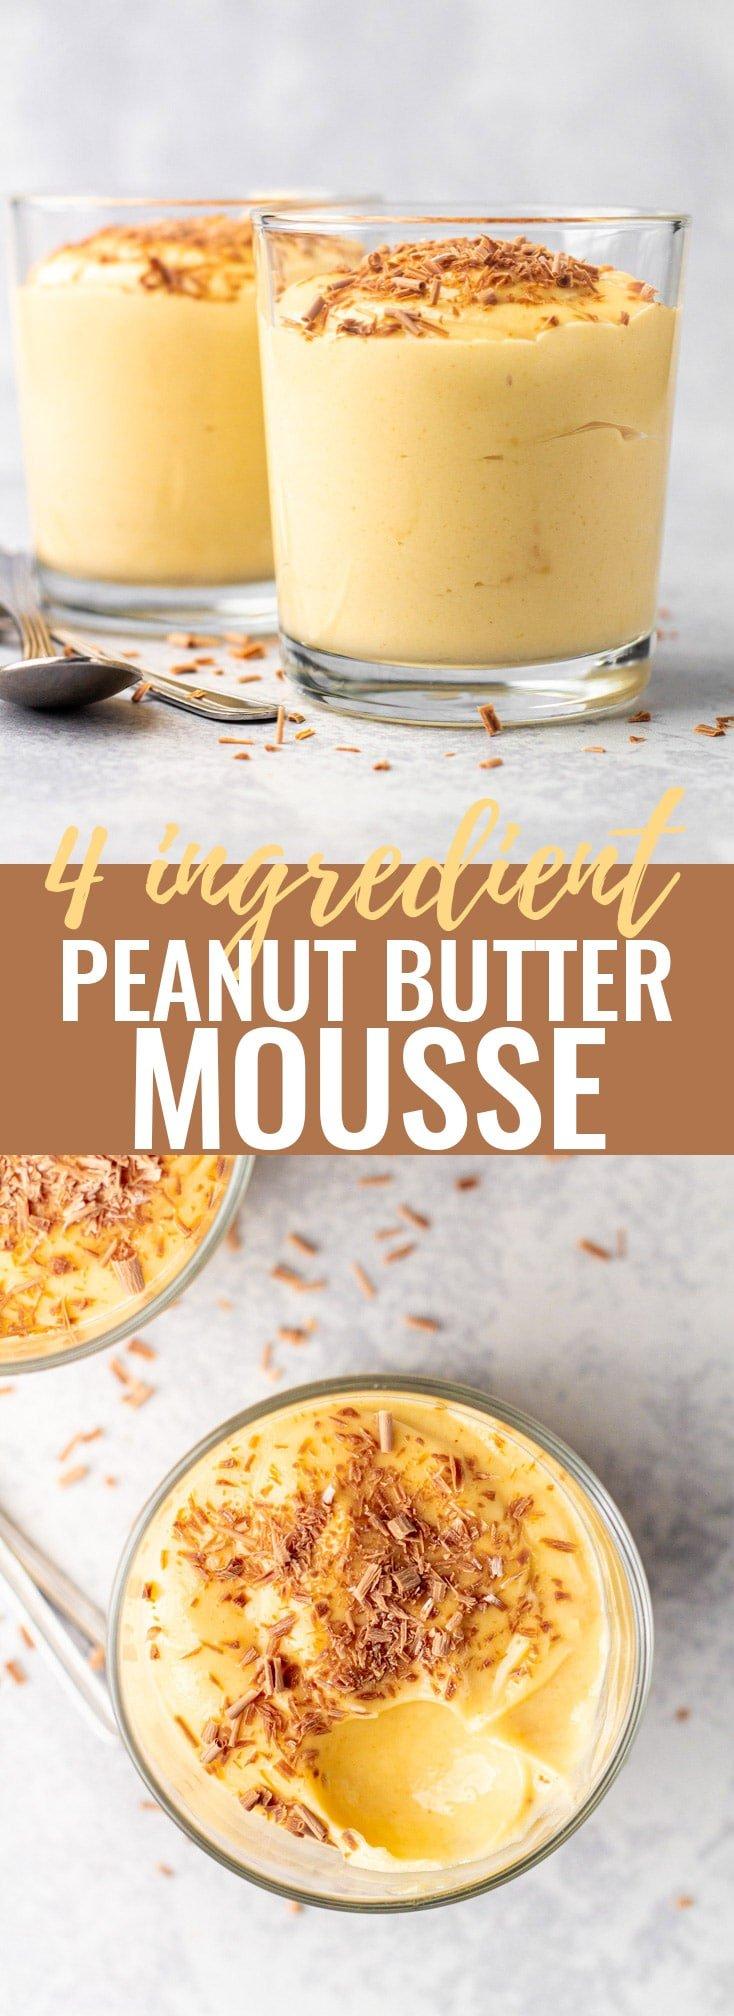 4 Ingredient Peanut Butter Mousse